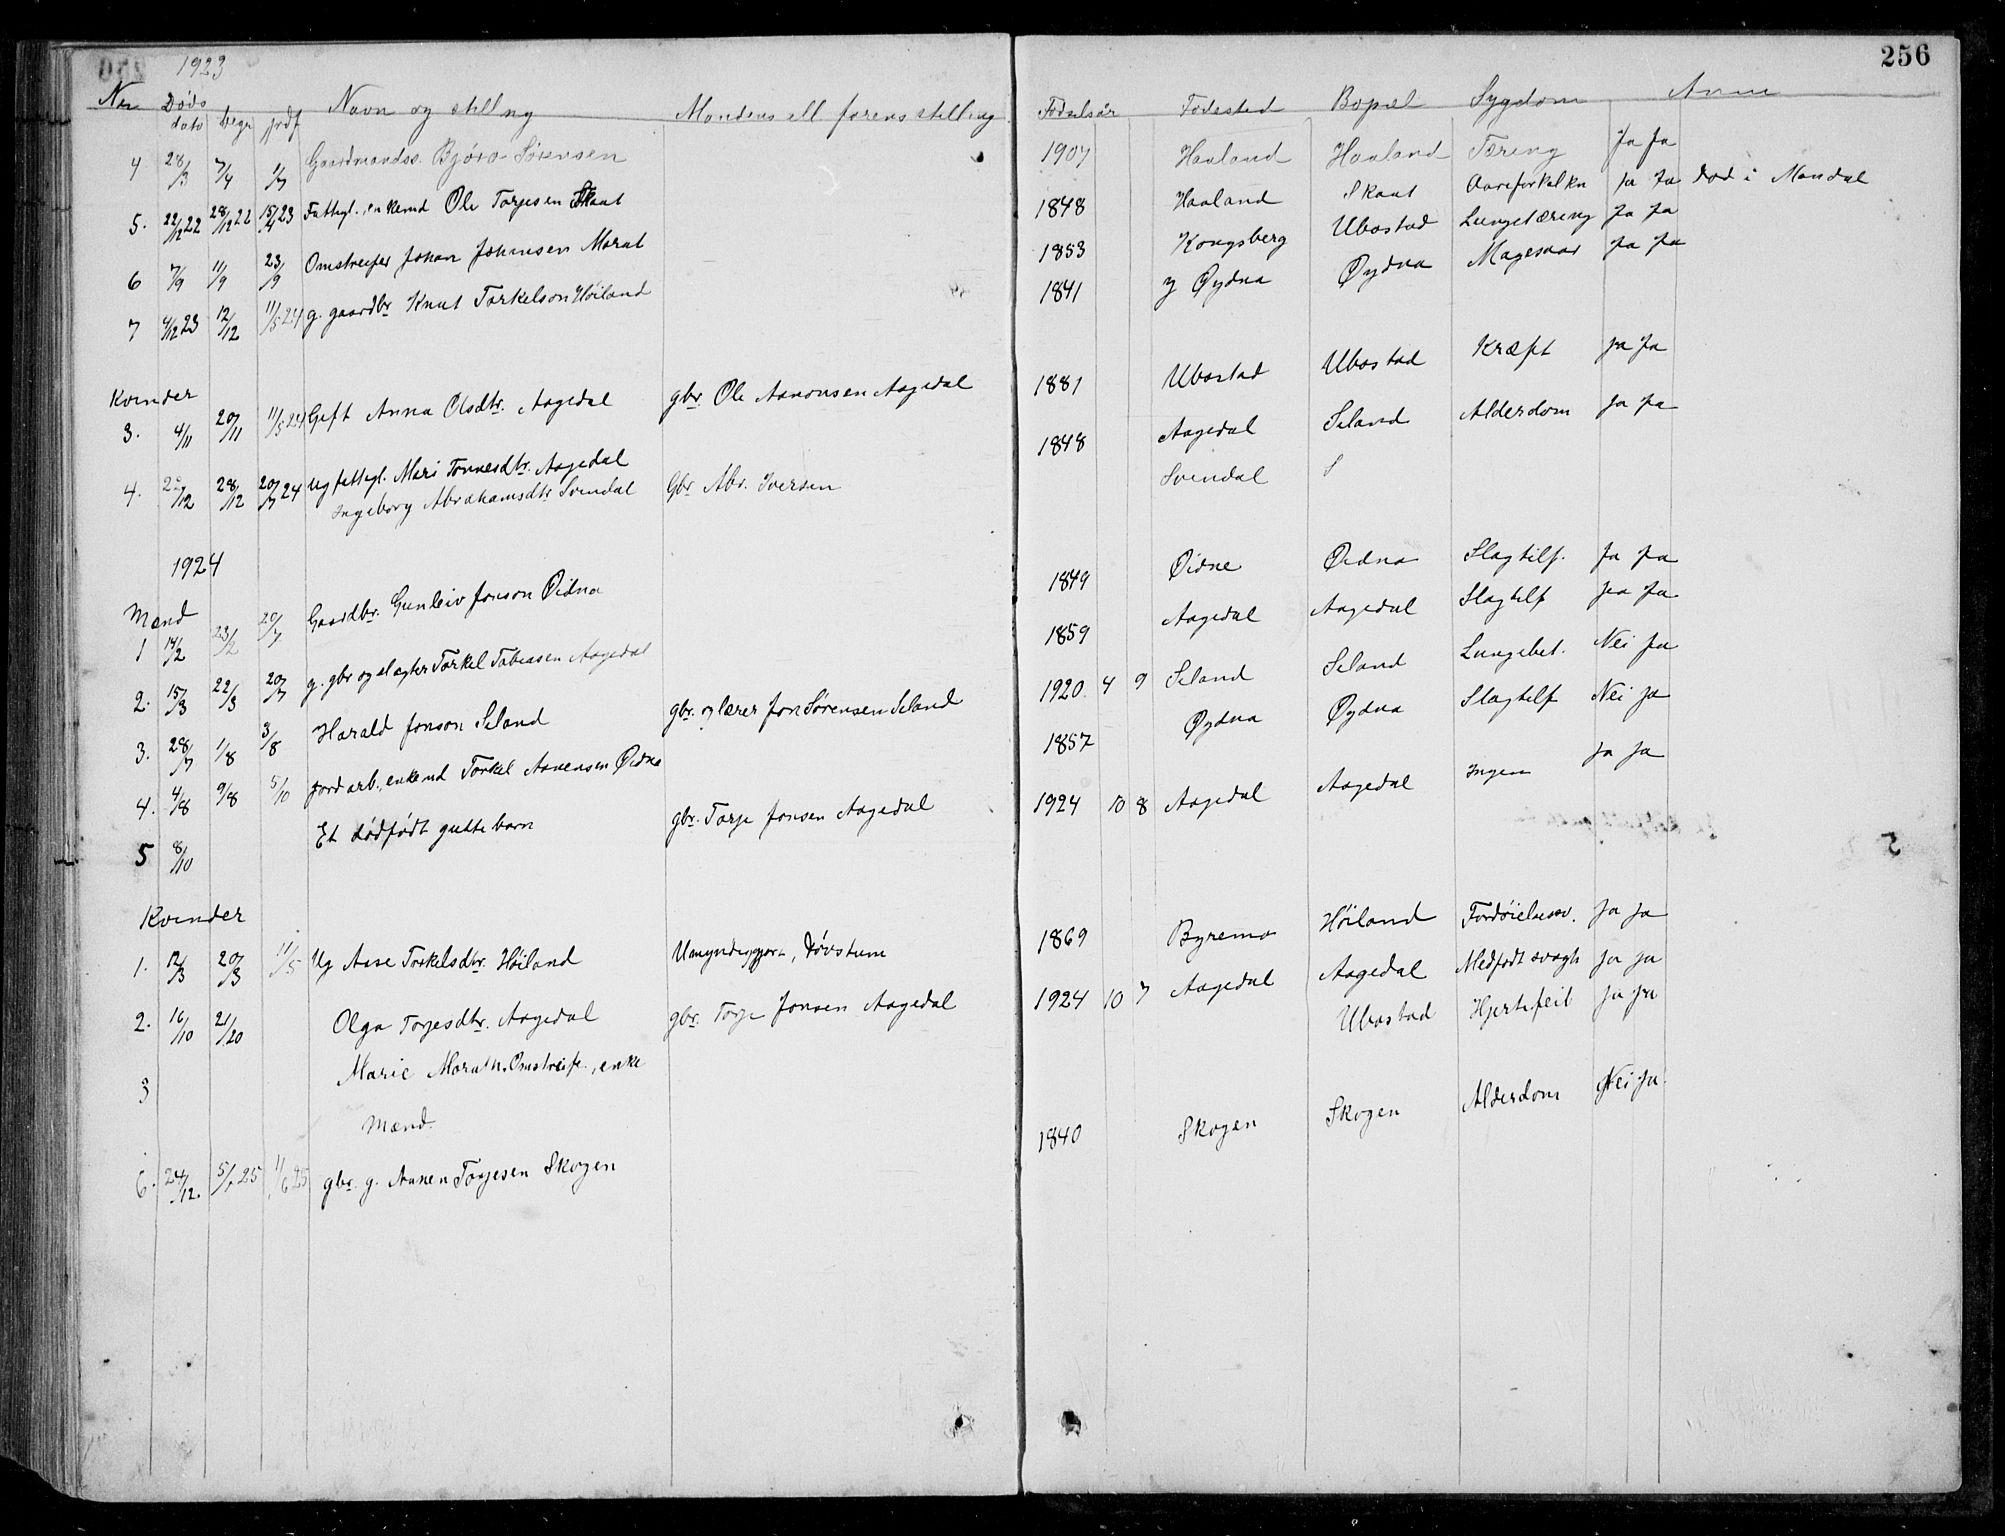 SAK, Bjelland sokneprestkontor, F/Fb/Fbc/L0003: Klokkerbok nr. B 3, 1887-1924, s. 256